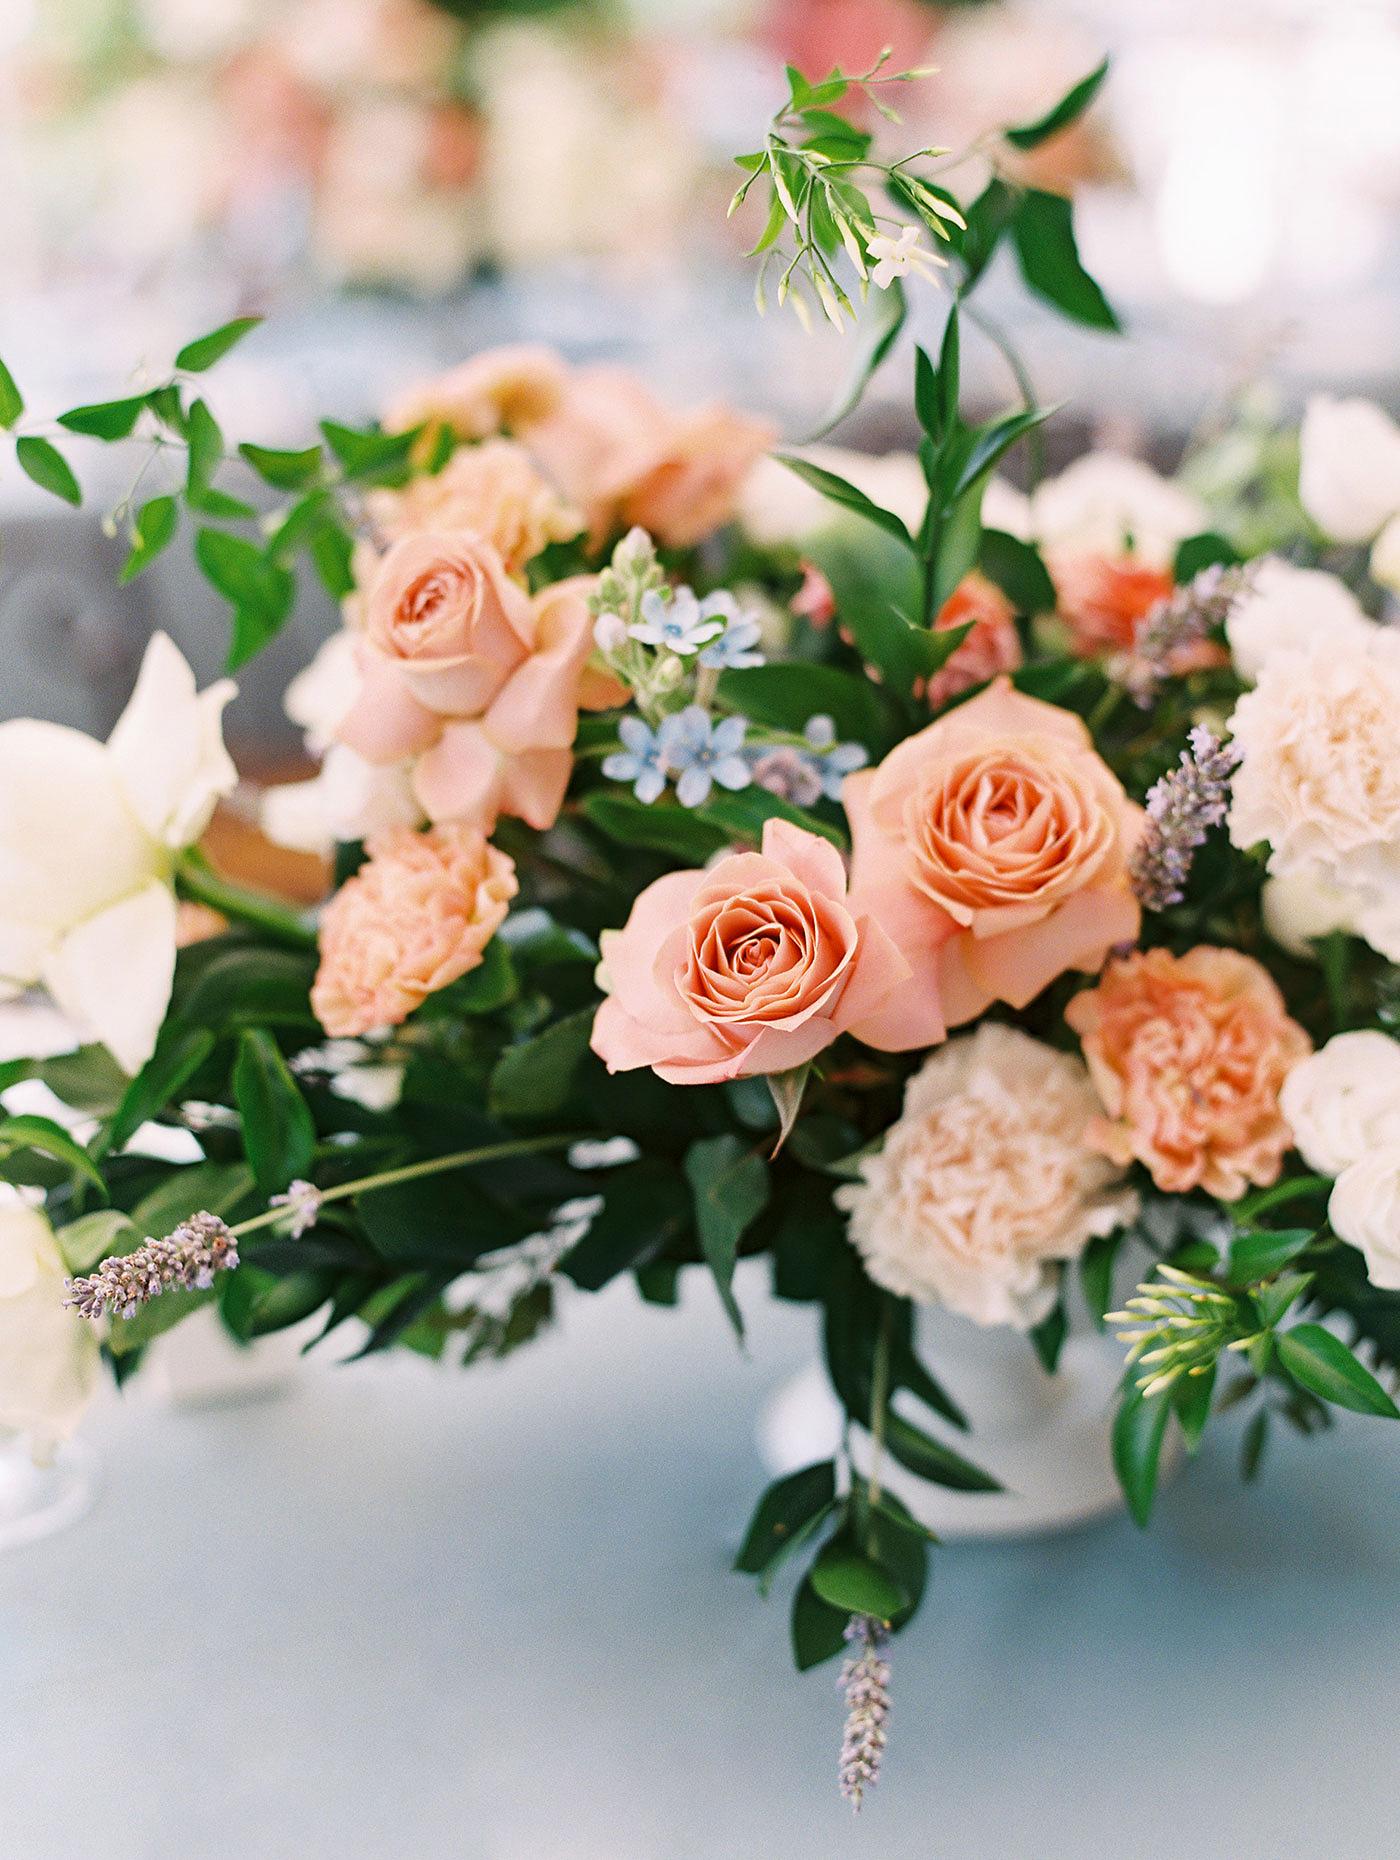 julia franz wedding reception centerpieces